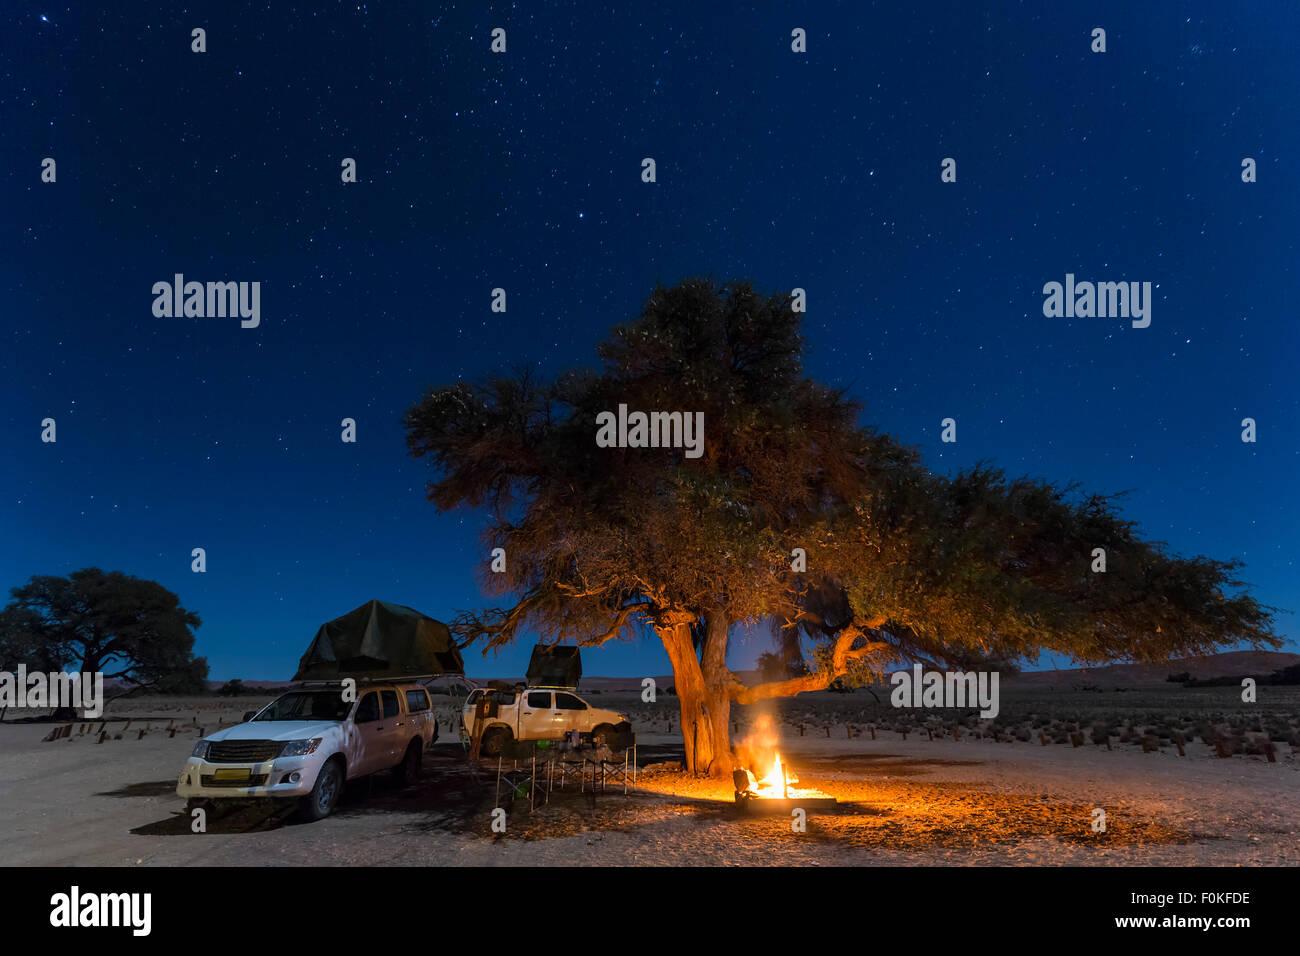 Namibia, Namib Desert, Namib Naukluft National Park, camping with camp fire by night - Stock Image